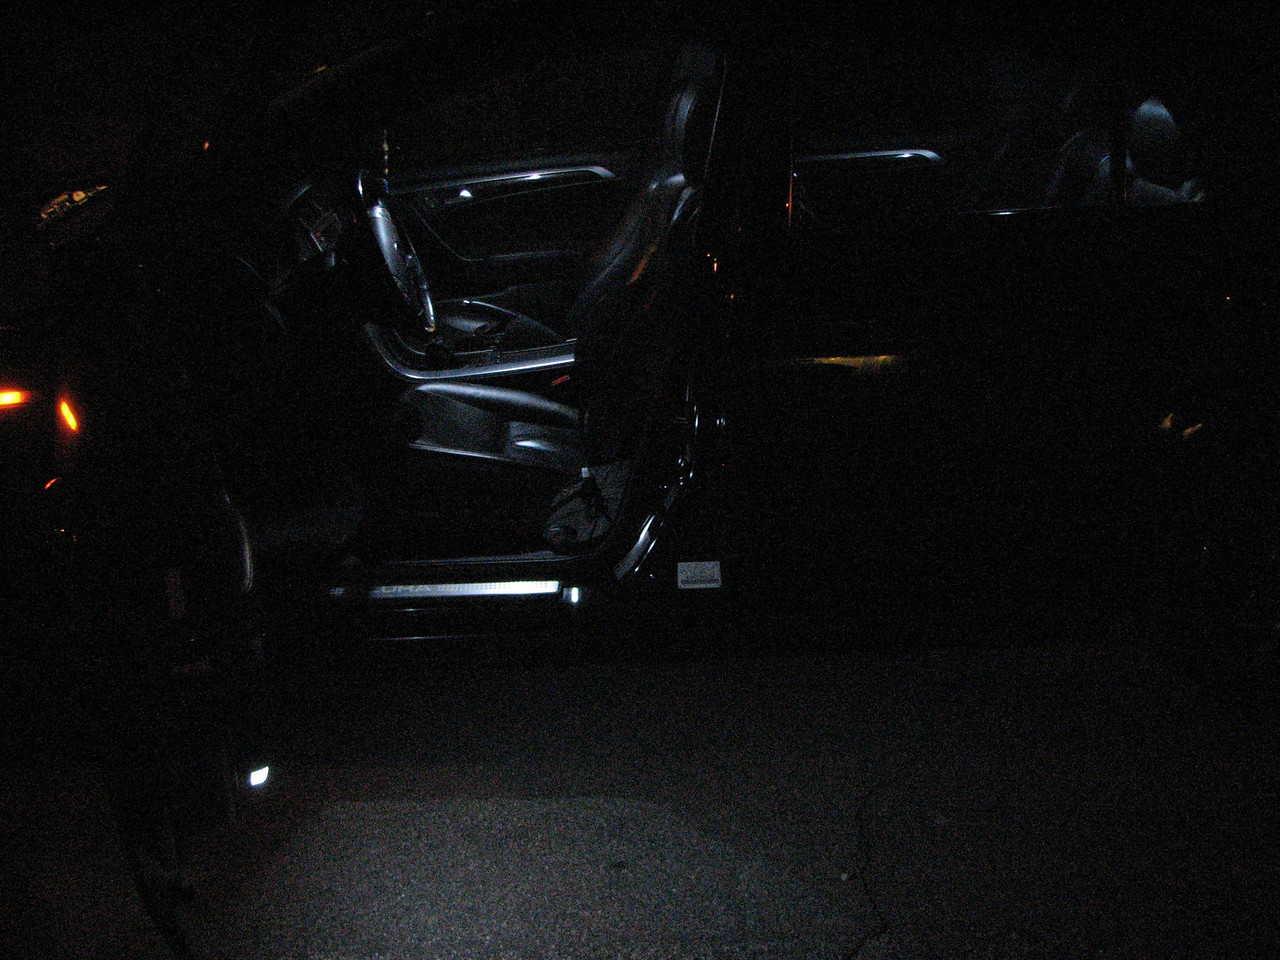 2008 01 23 Wed - NX ALONE - Left door open interior LEDs profile